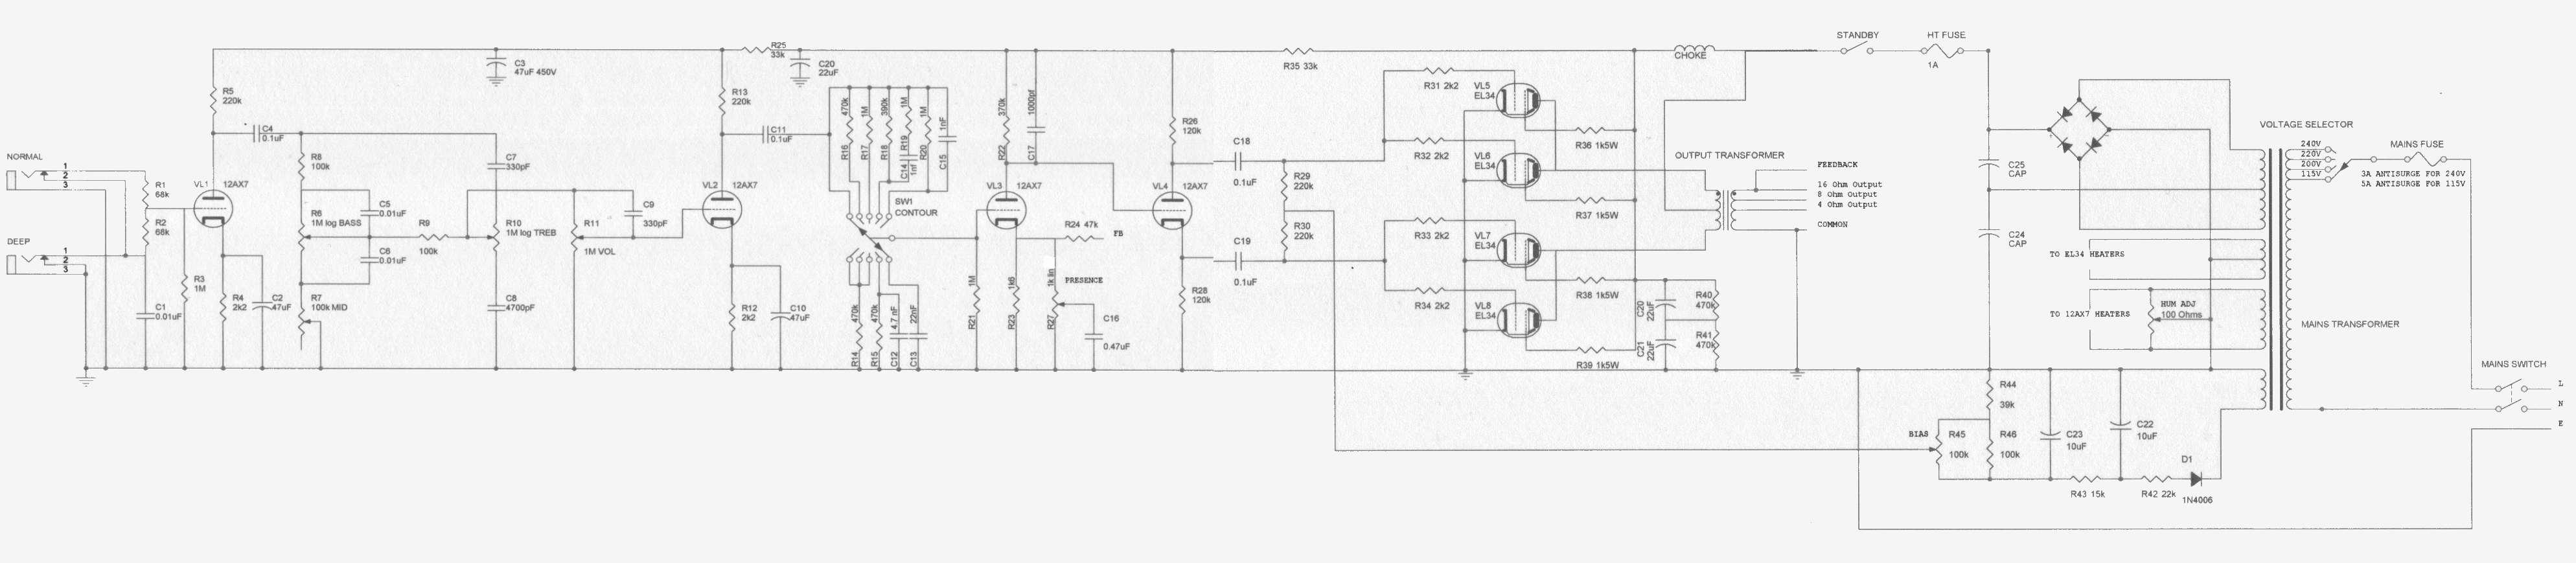 1979 Orange Superb Schematic - Completed - Orange Amps Forum on